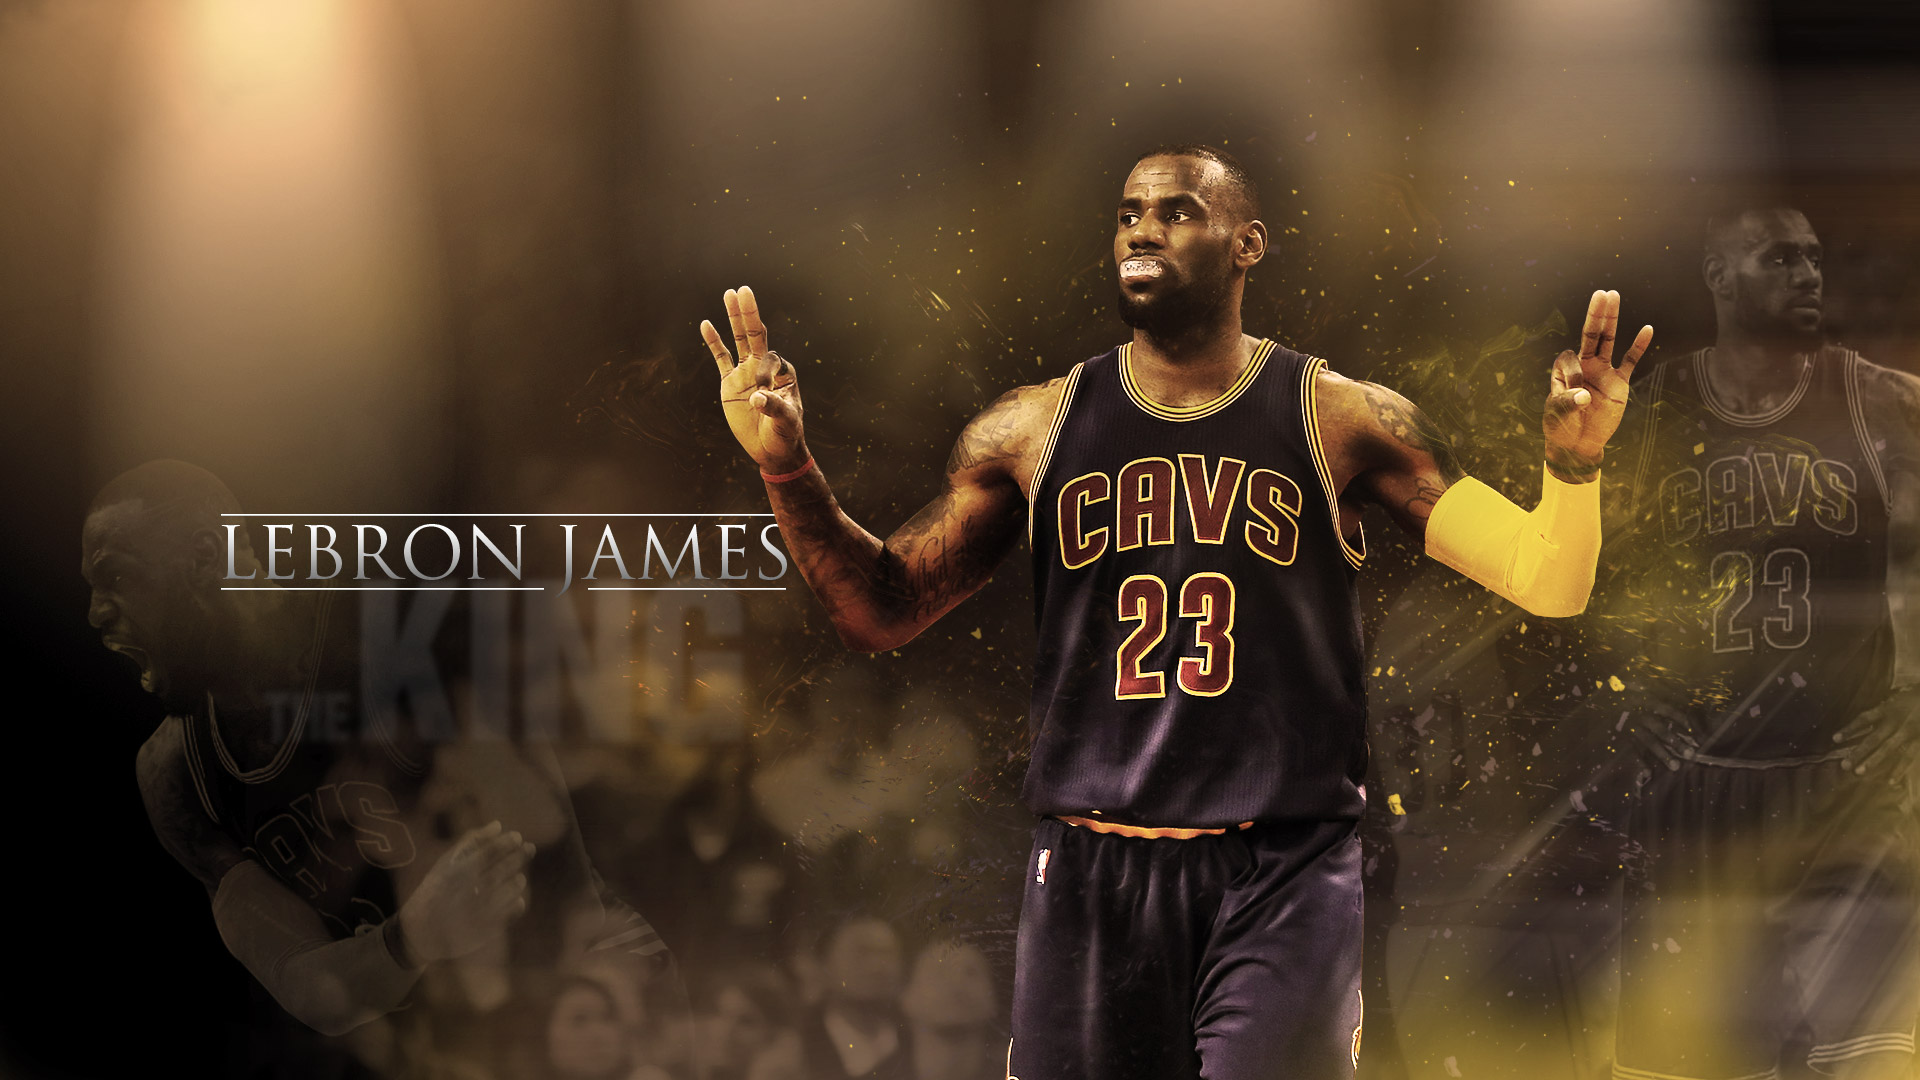 James Cavaliers 2016 19201080 Wallpaper Basketball Wallpapers 1920x1080